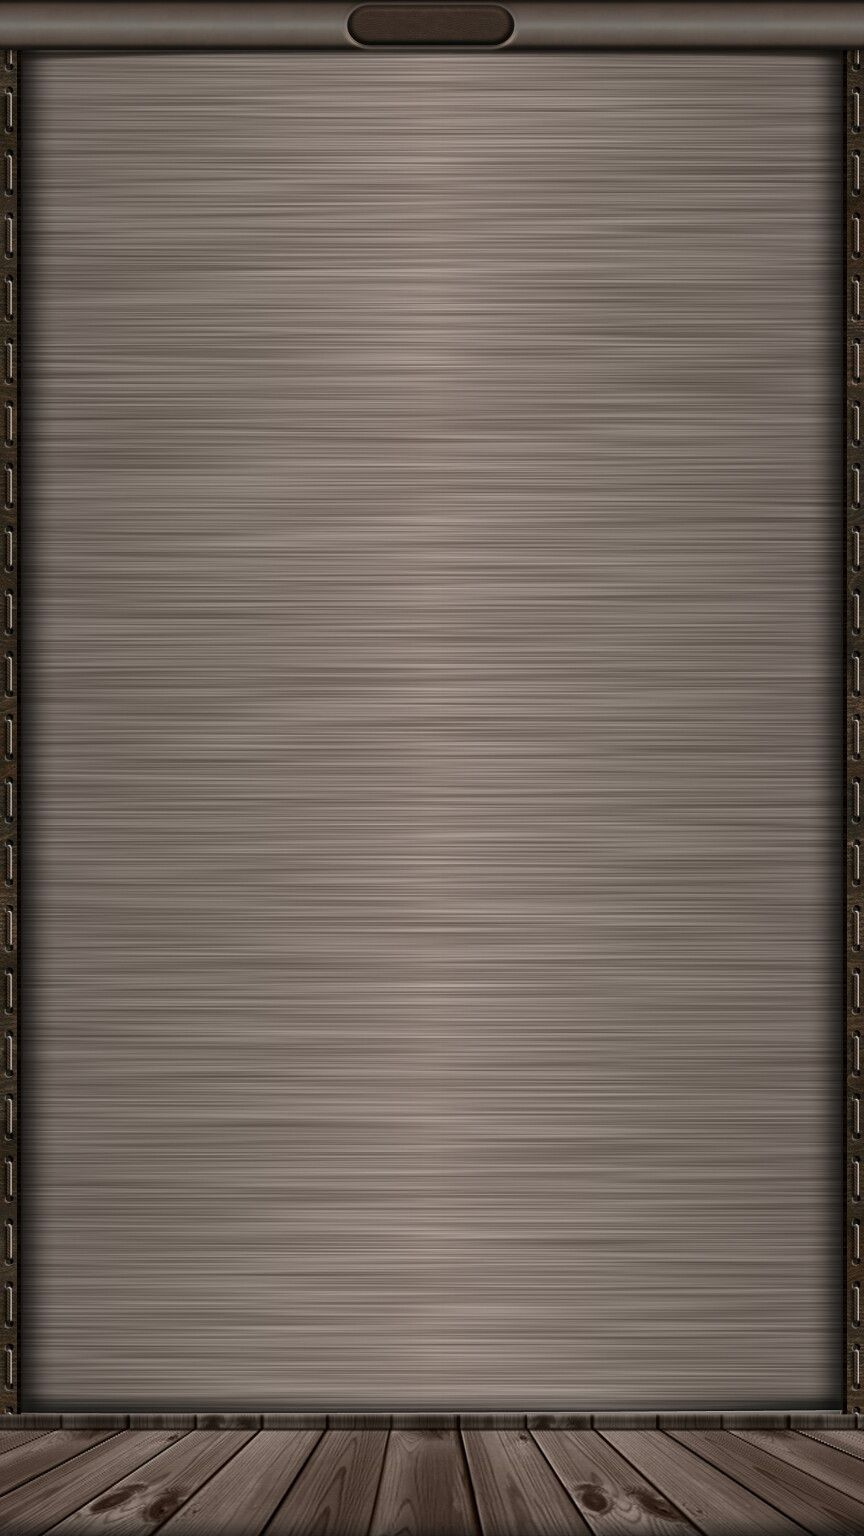 Sleek Neutral Steel Wallpaper Phone Wallpaper Patterns Phone Wallpaper Cellphone Wallpaper